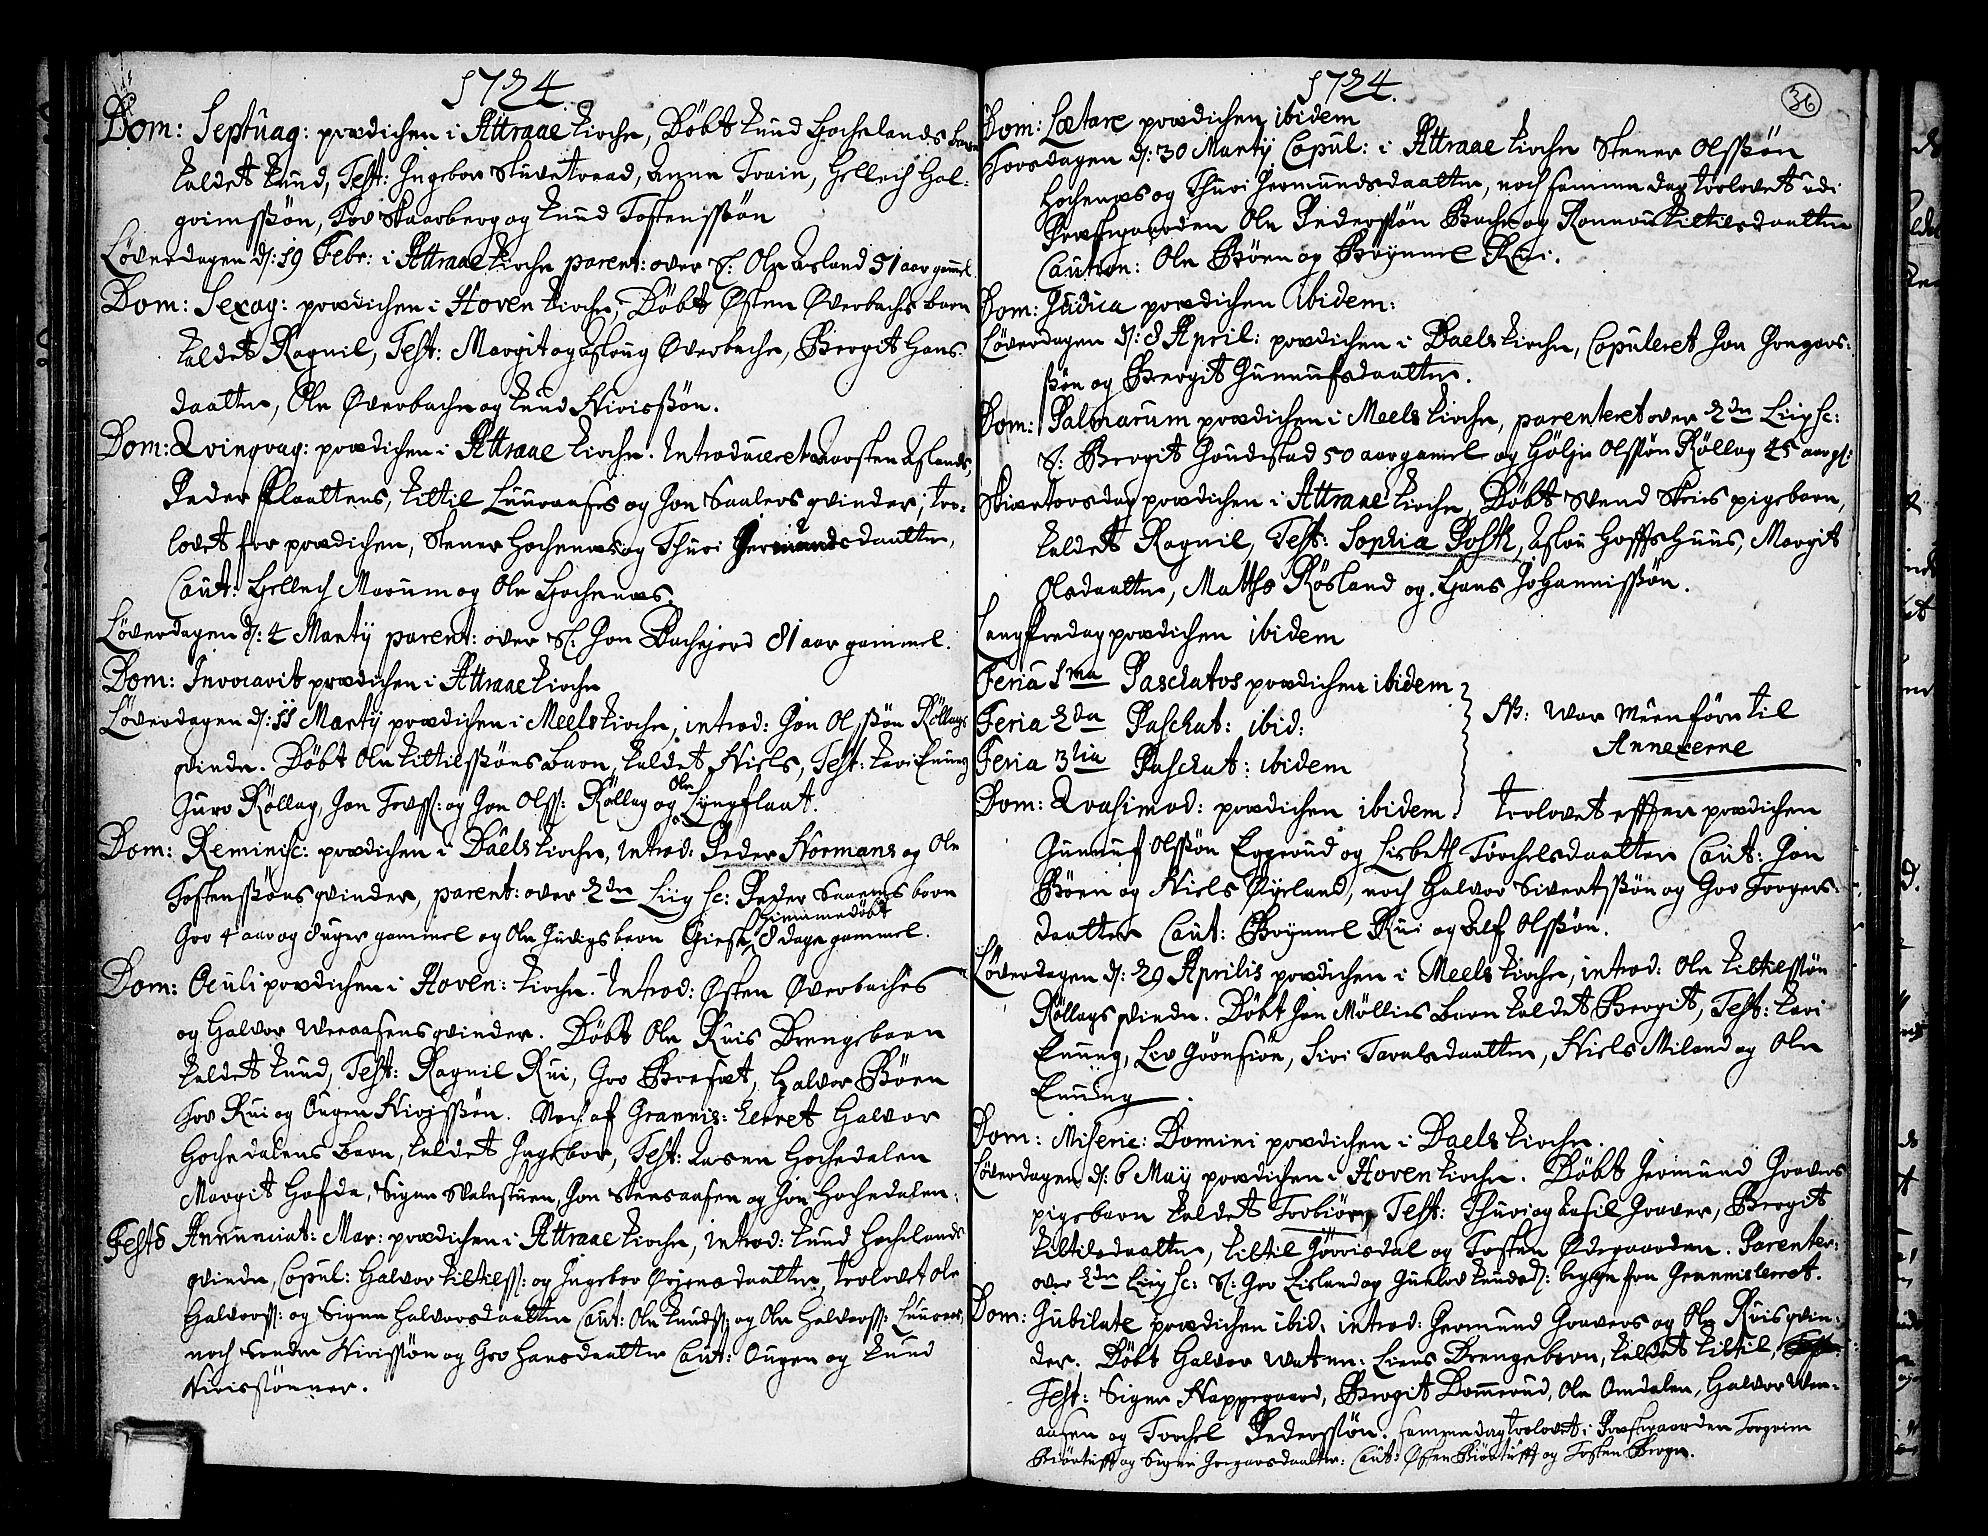 SAKO, Tinn kirkebøker, F/Fa/L0001: Ministerialbok nr. I 1, 1717-1734, s. 36